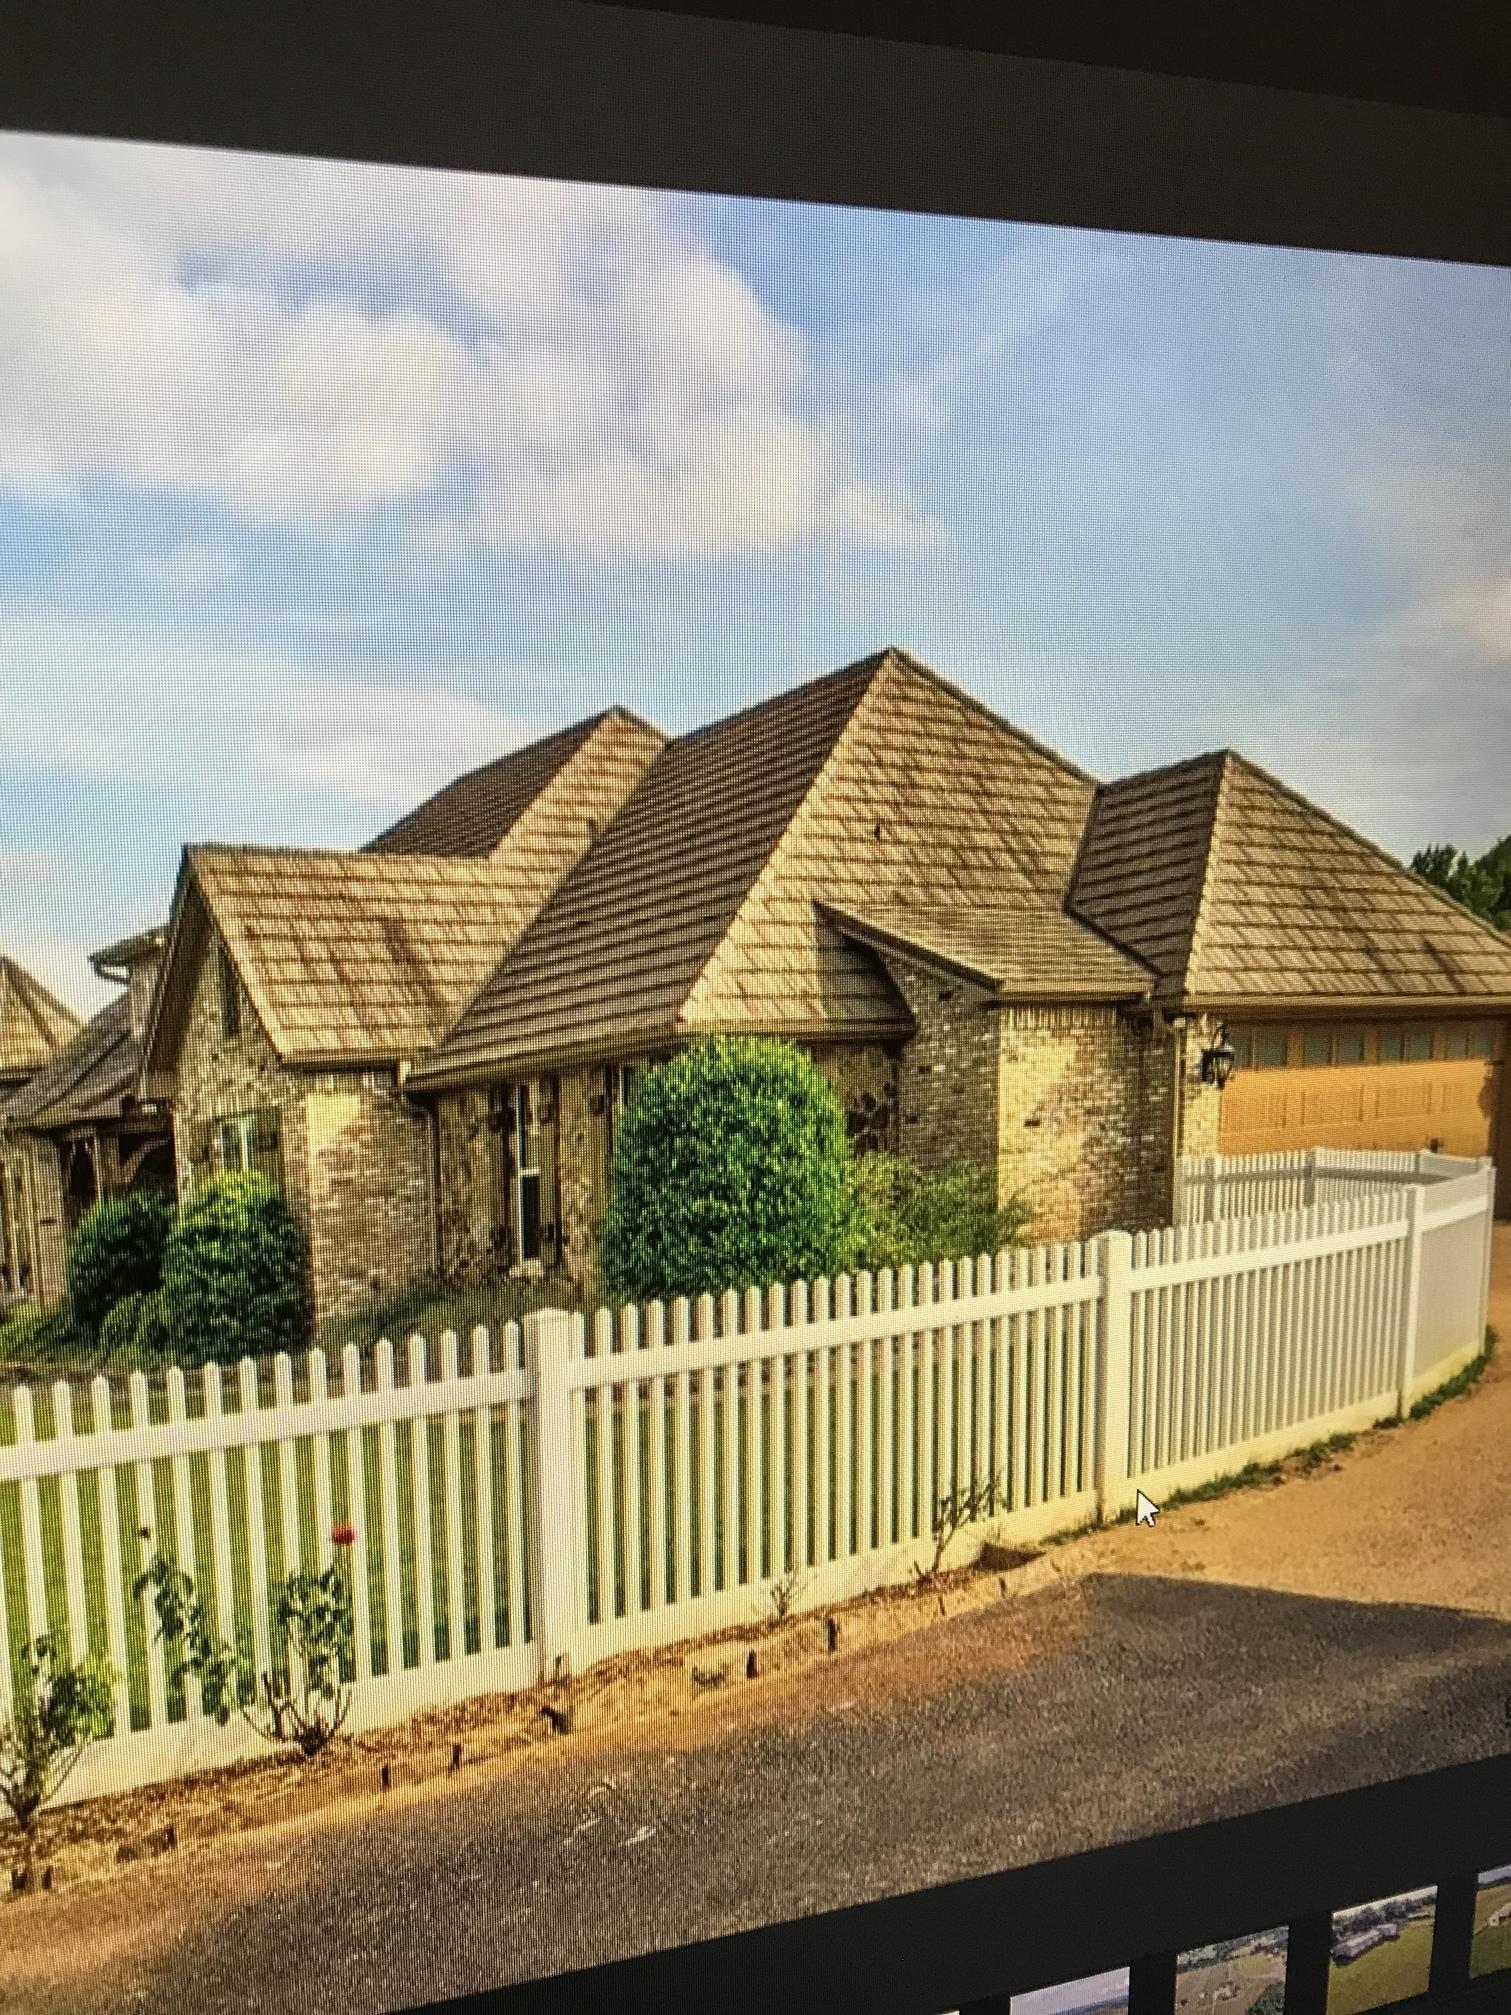 Tile Shingle Roof Residential Pressure Washing Resource – Can You Pressure Wash A Shingle Roof